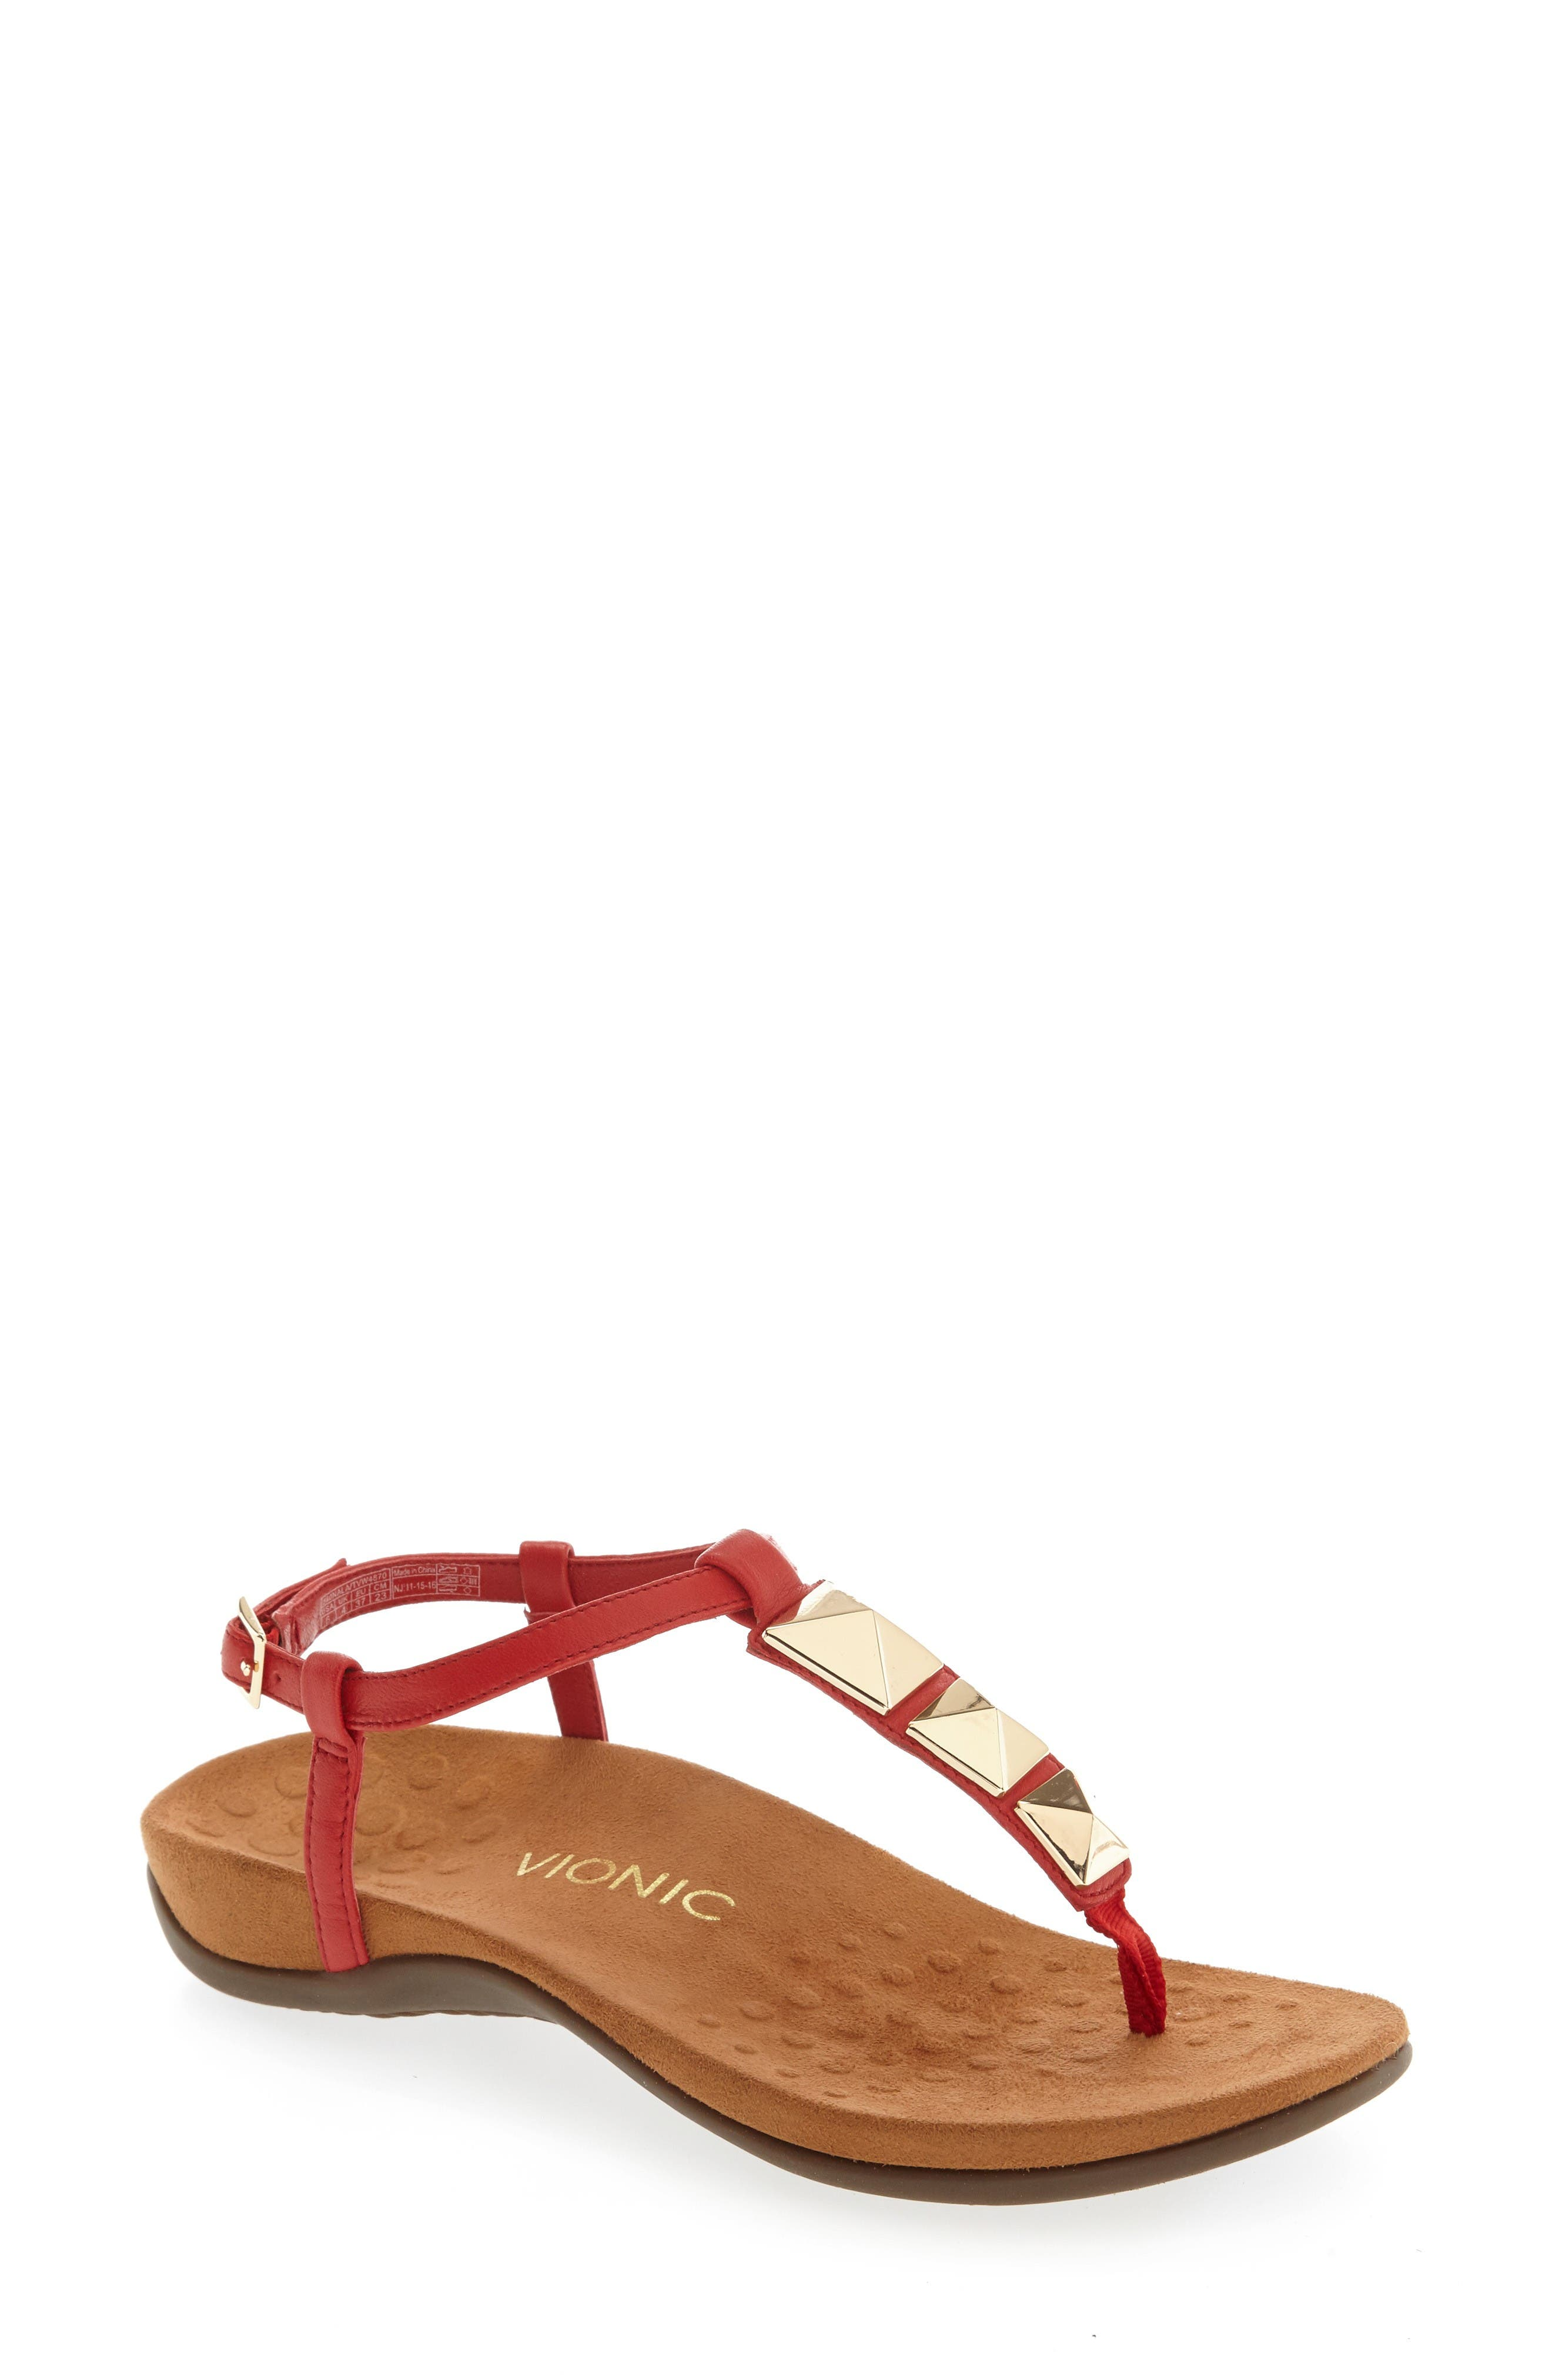 Main Image - Vionic Nala T-Strap Sandal (Women)